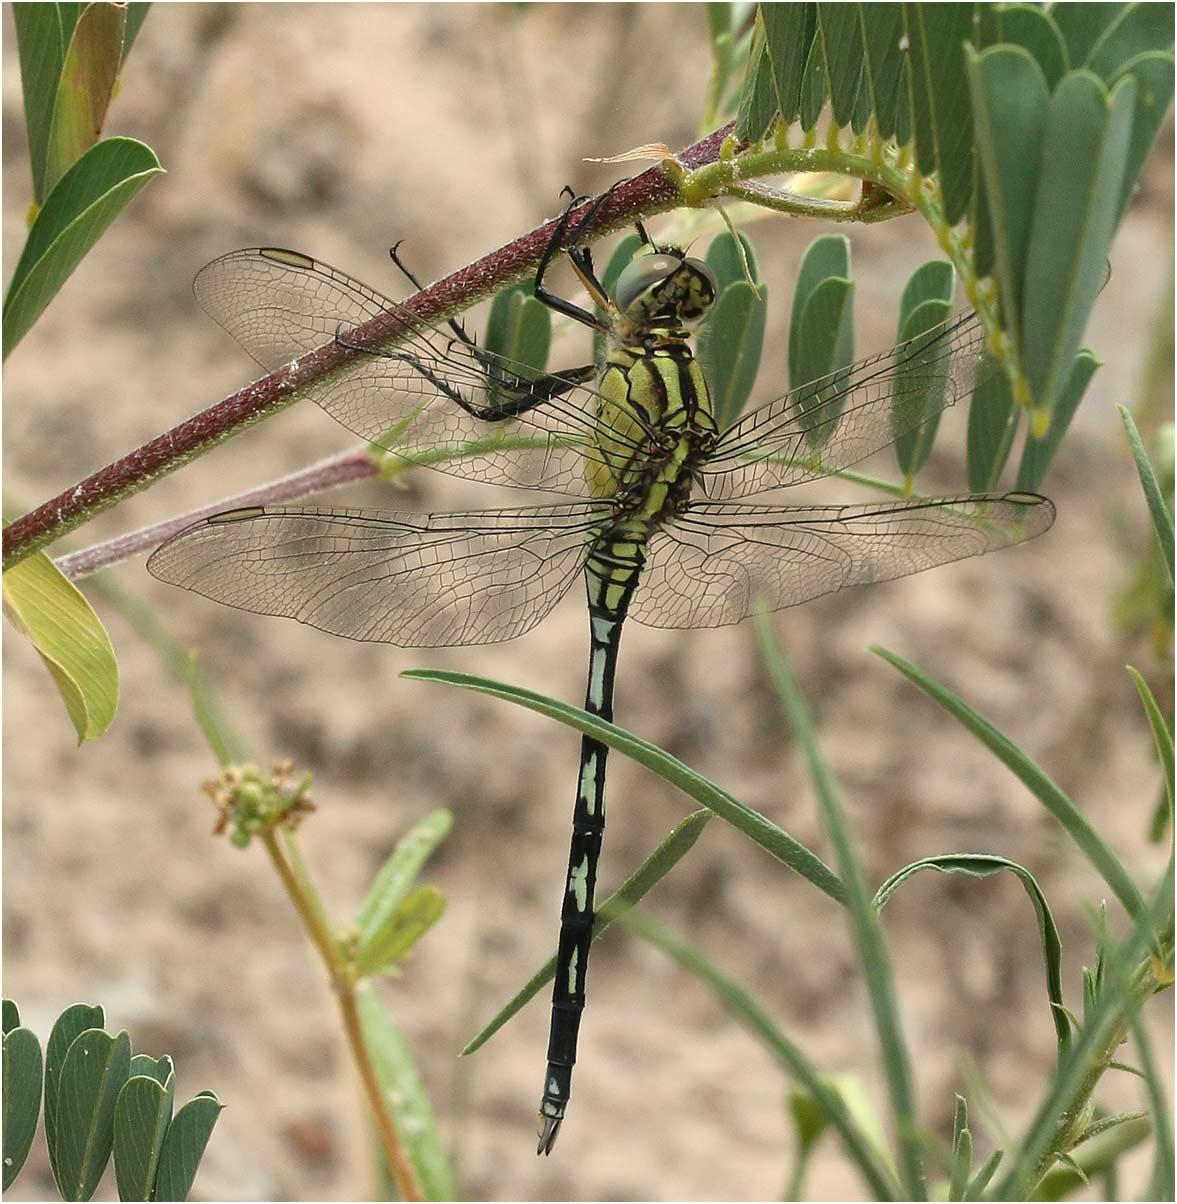 Orthetrum trinacria mâle immature, Namibie, barrage Von Bach, 22/02/2020